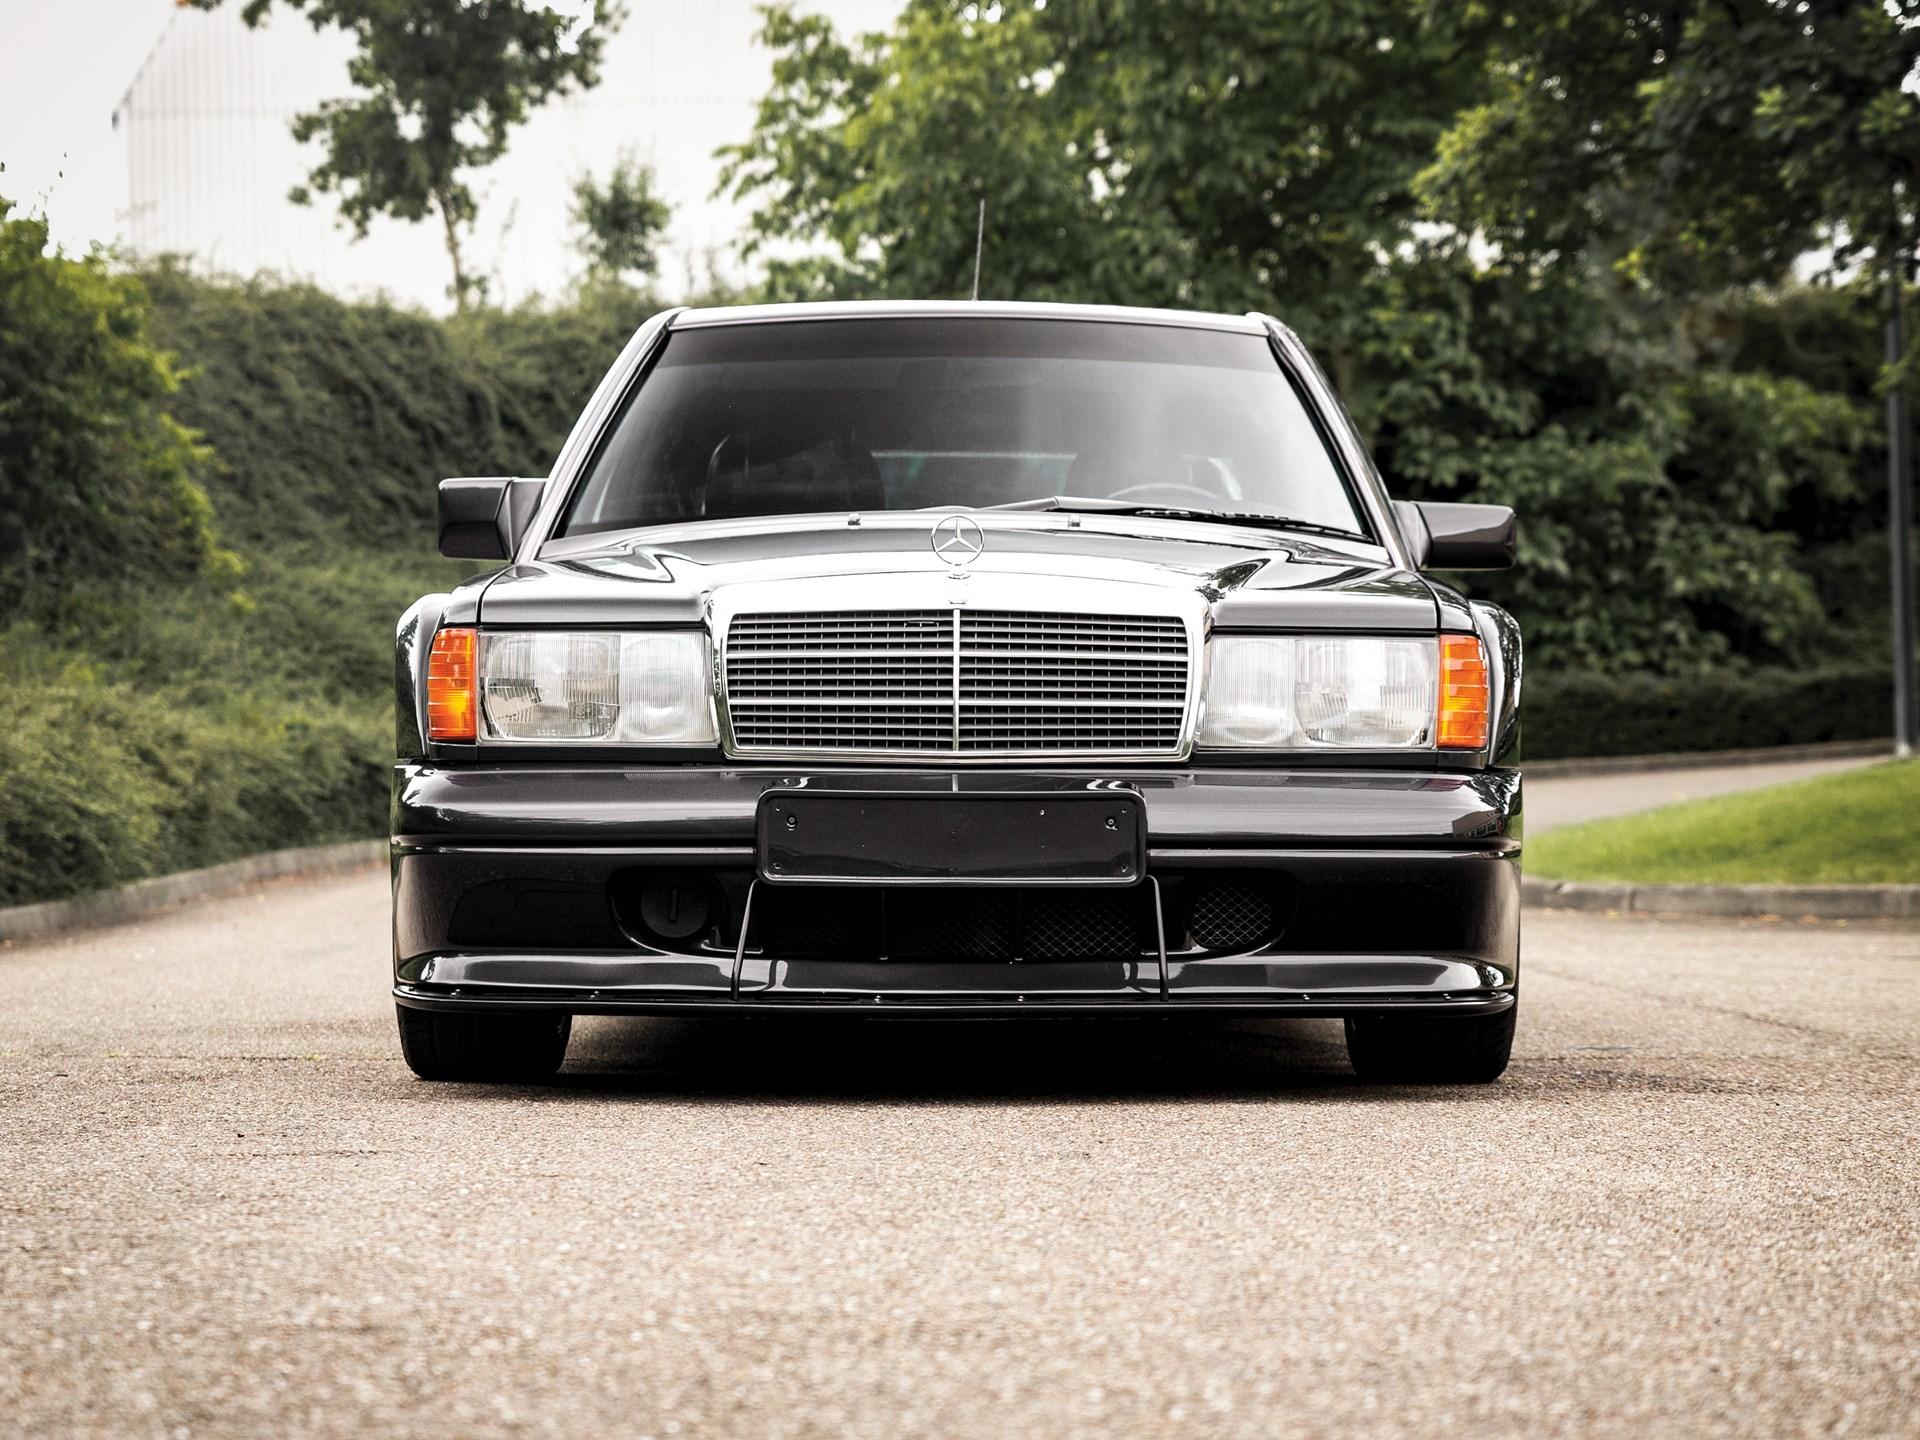 RM Sotheby's - 1990 Mercedes-Benz 190 E 2 5-16 Evolution II